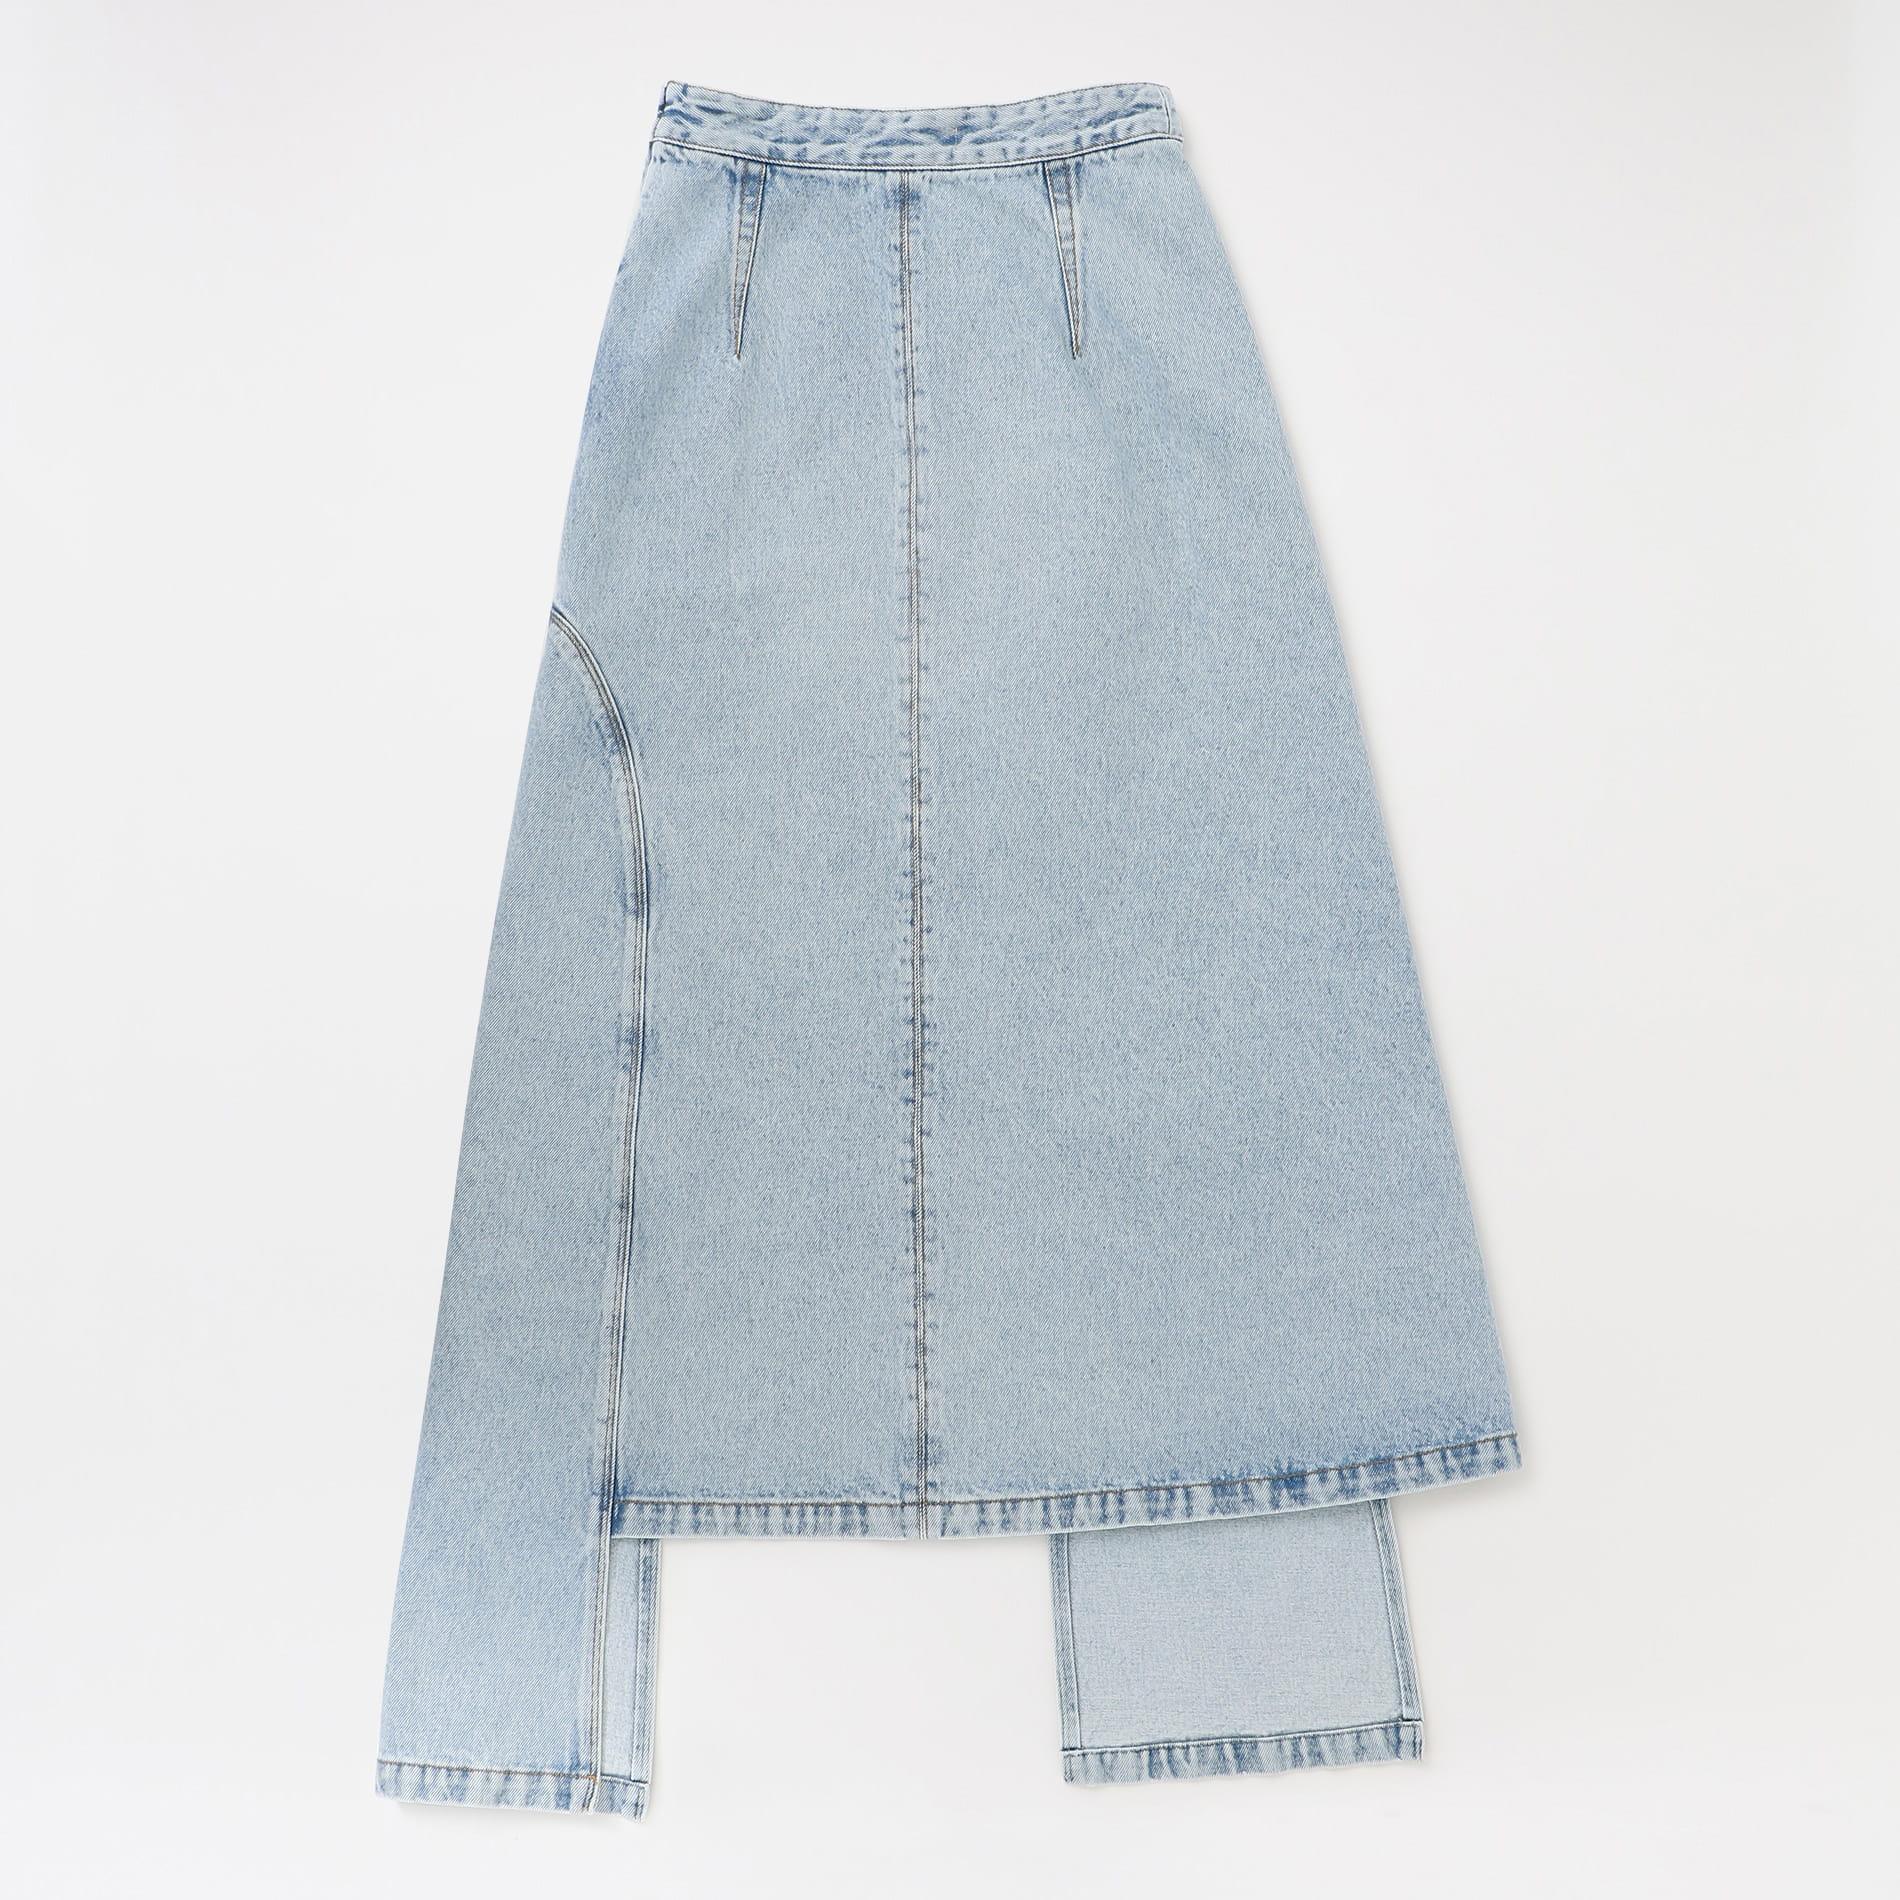 【SSHEENA】WOMEN デニムスカート JARED DS20002